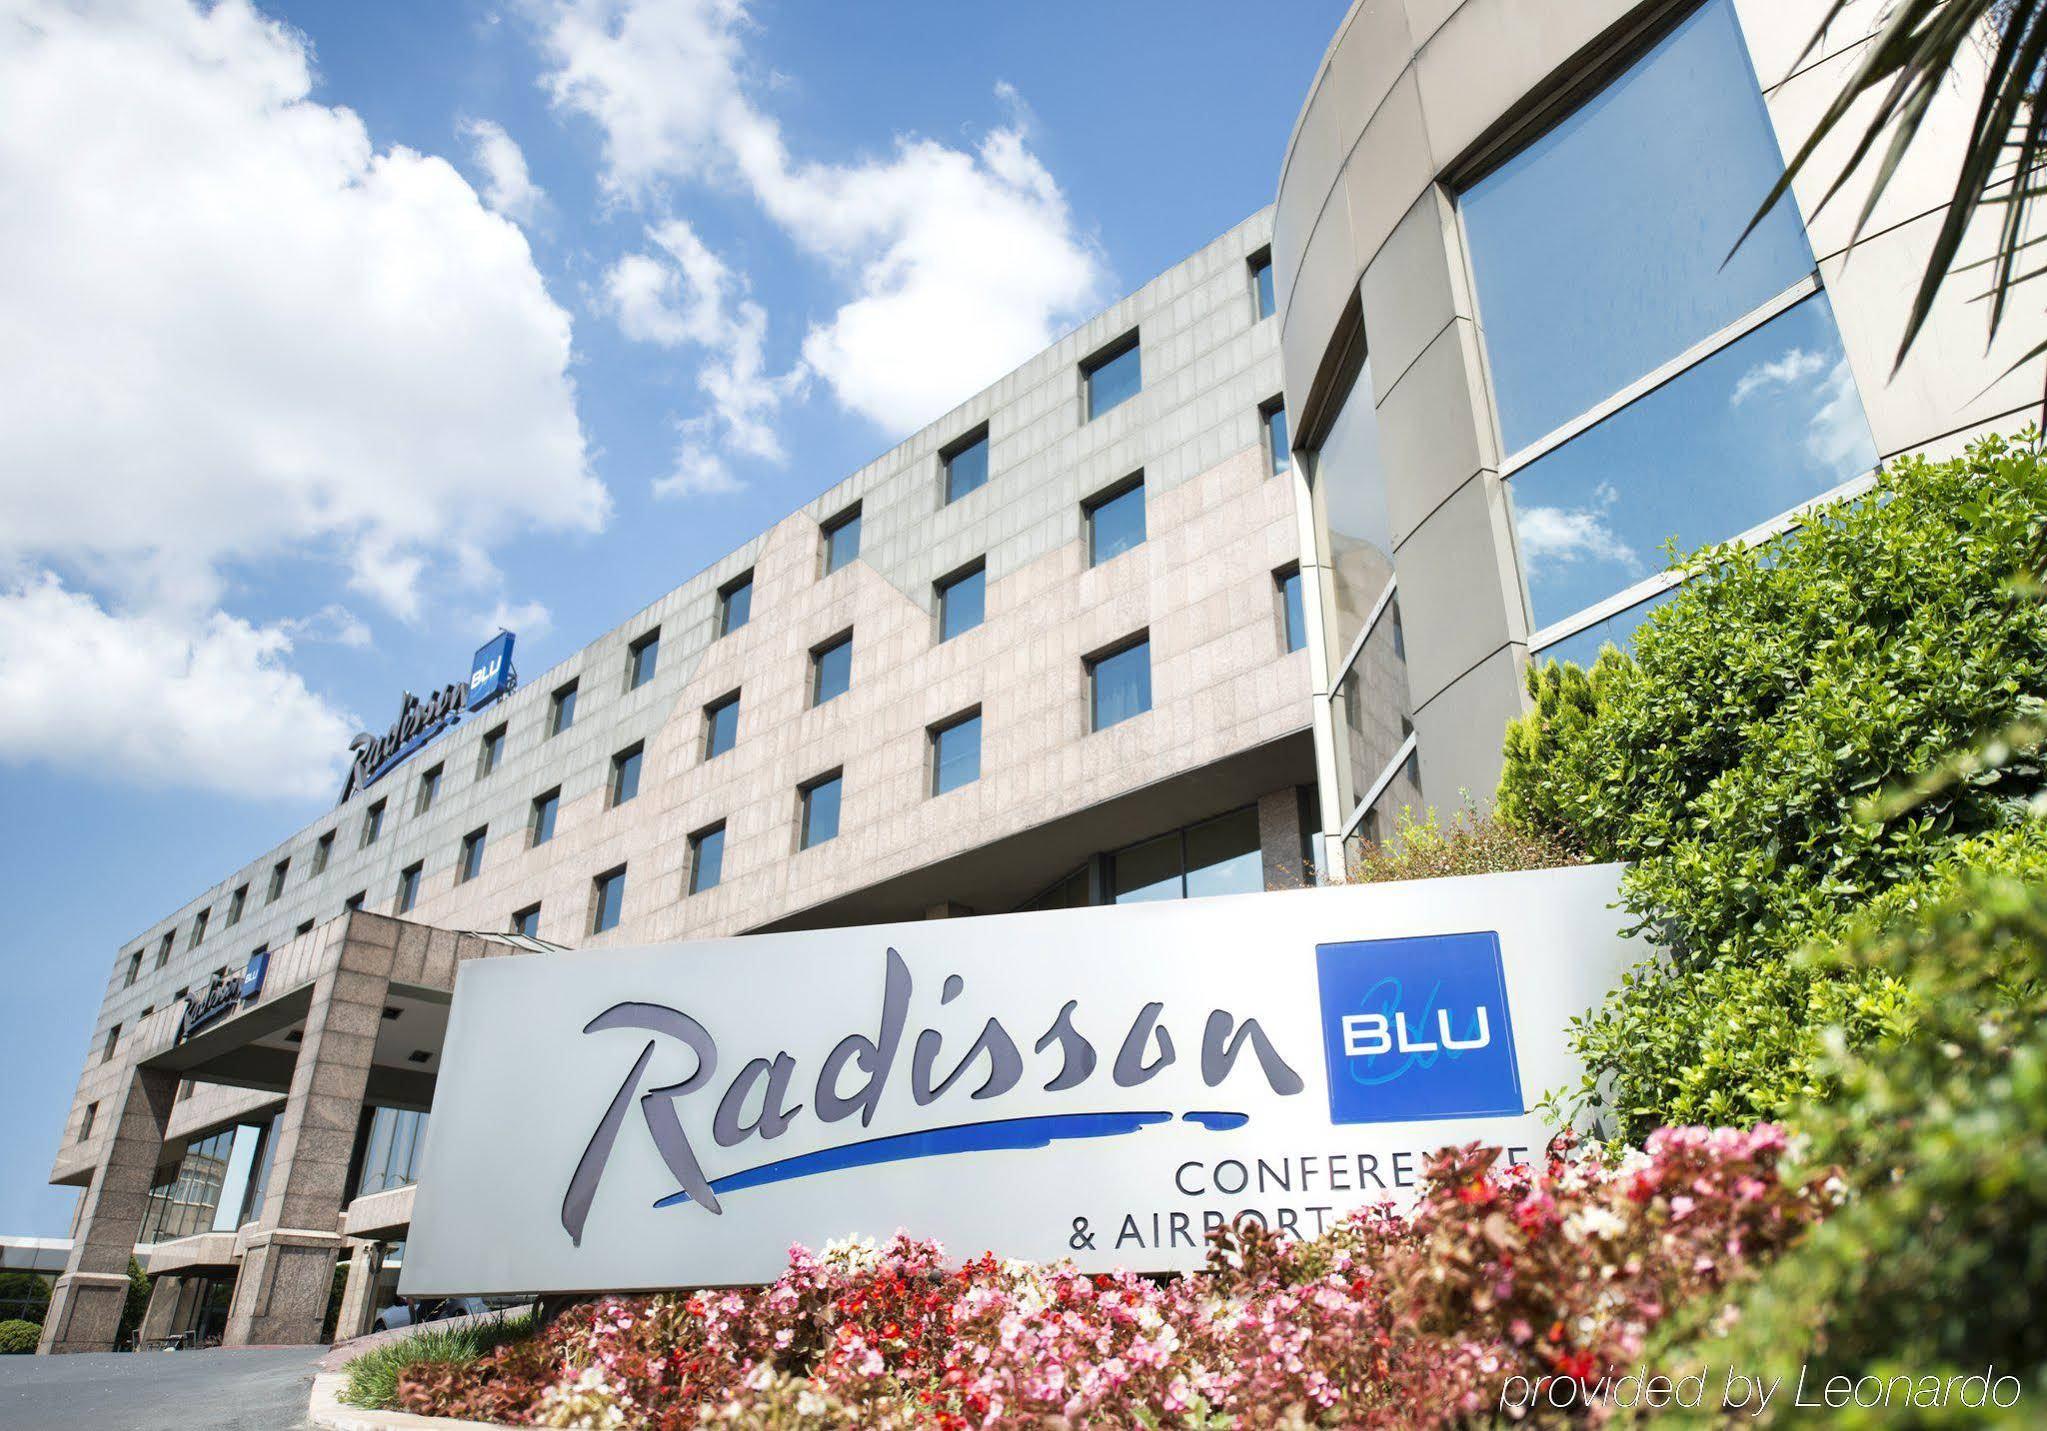 Radisson Blu Anchorage_Investing Impact Capital_2.jpg